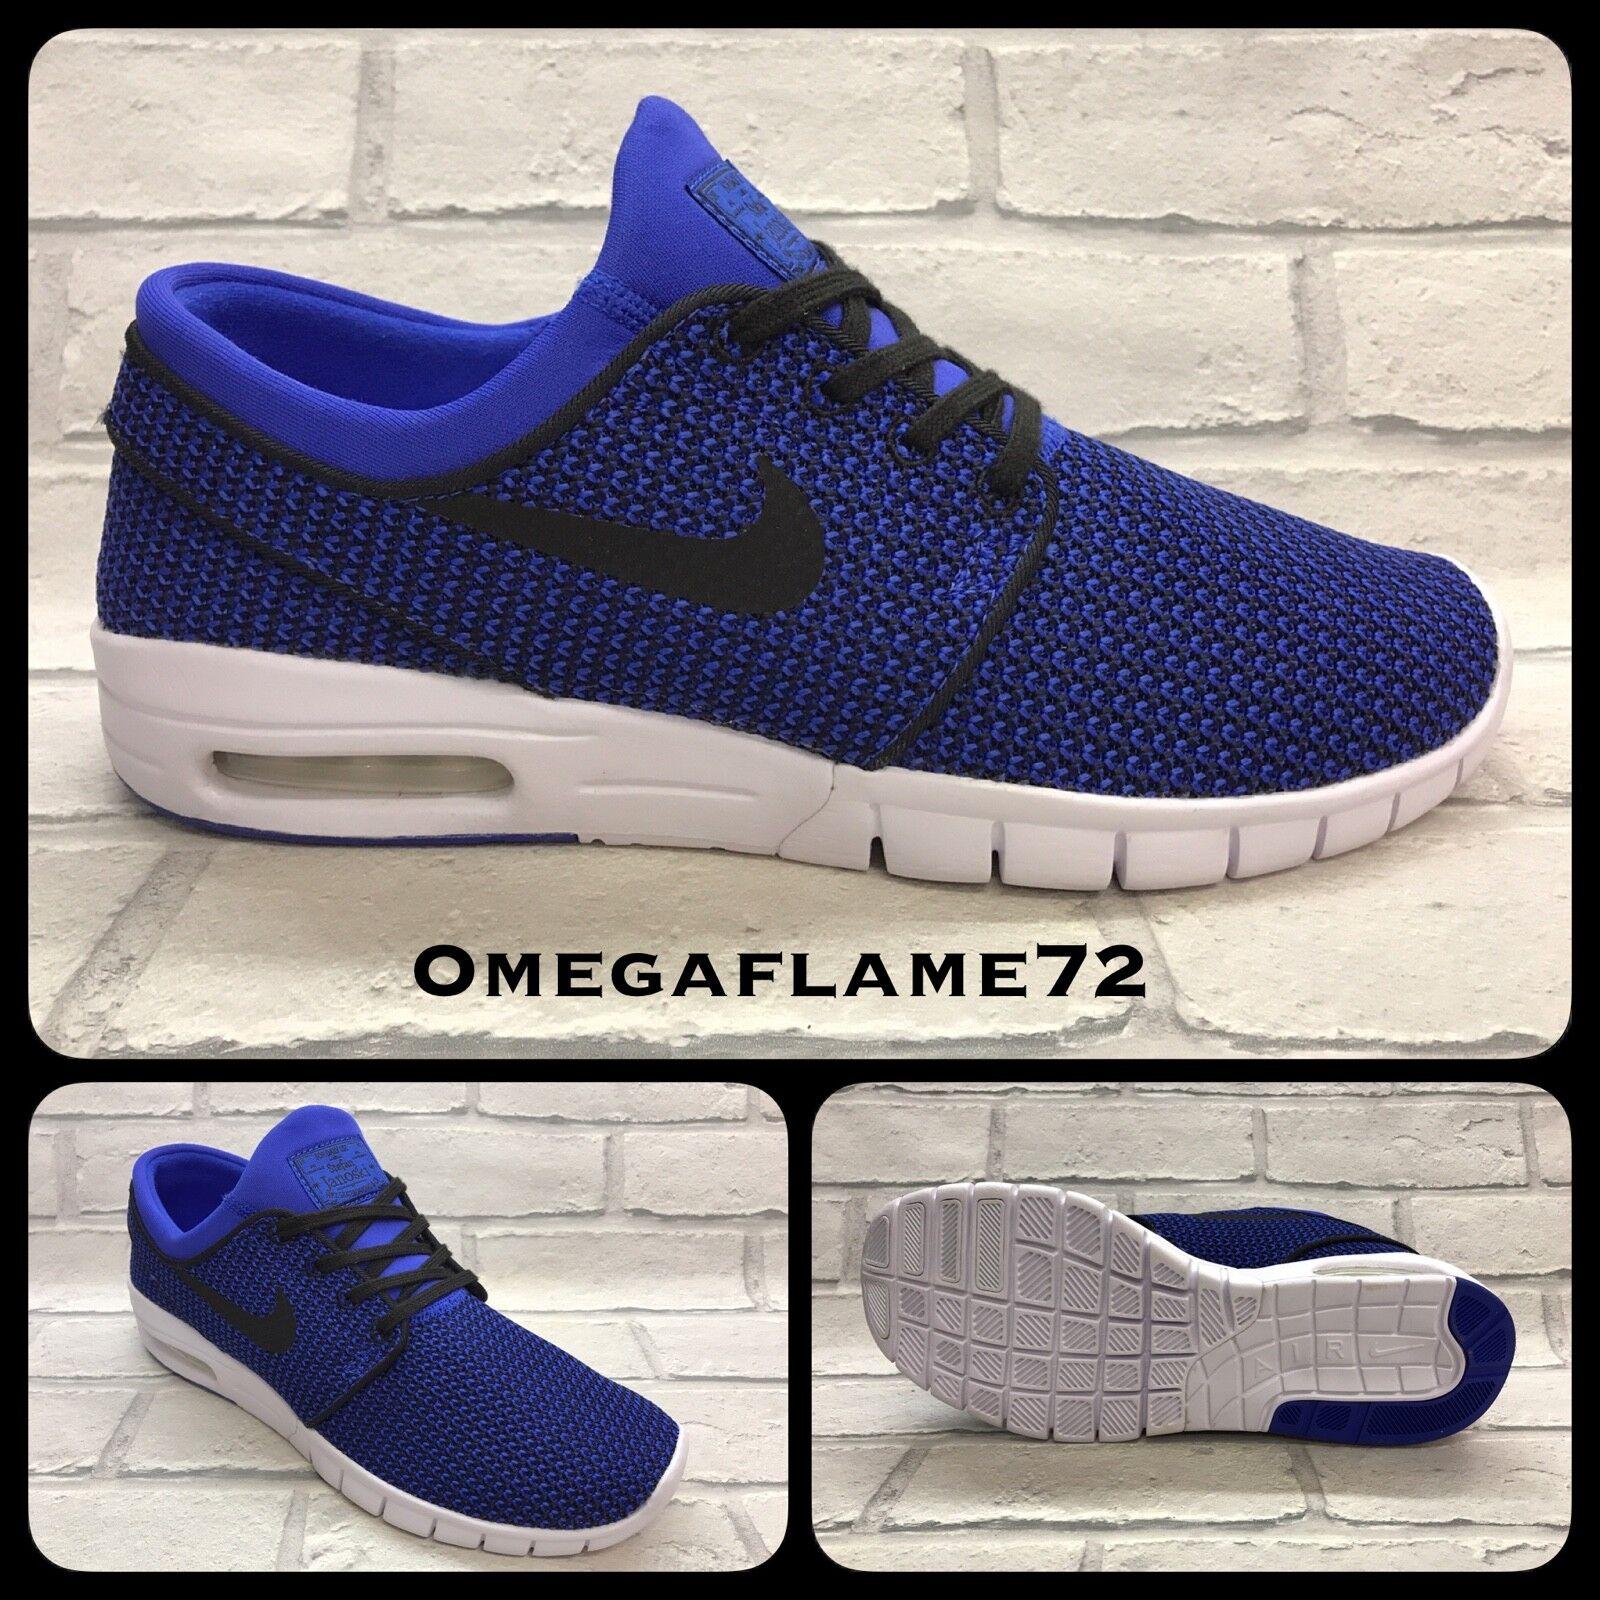 online store 63be8 658a5 Nike SB air max Stefan janoski, US 9, 9, 9, 631303-403, Racer Bleu, 181588